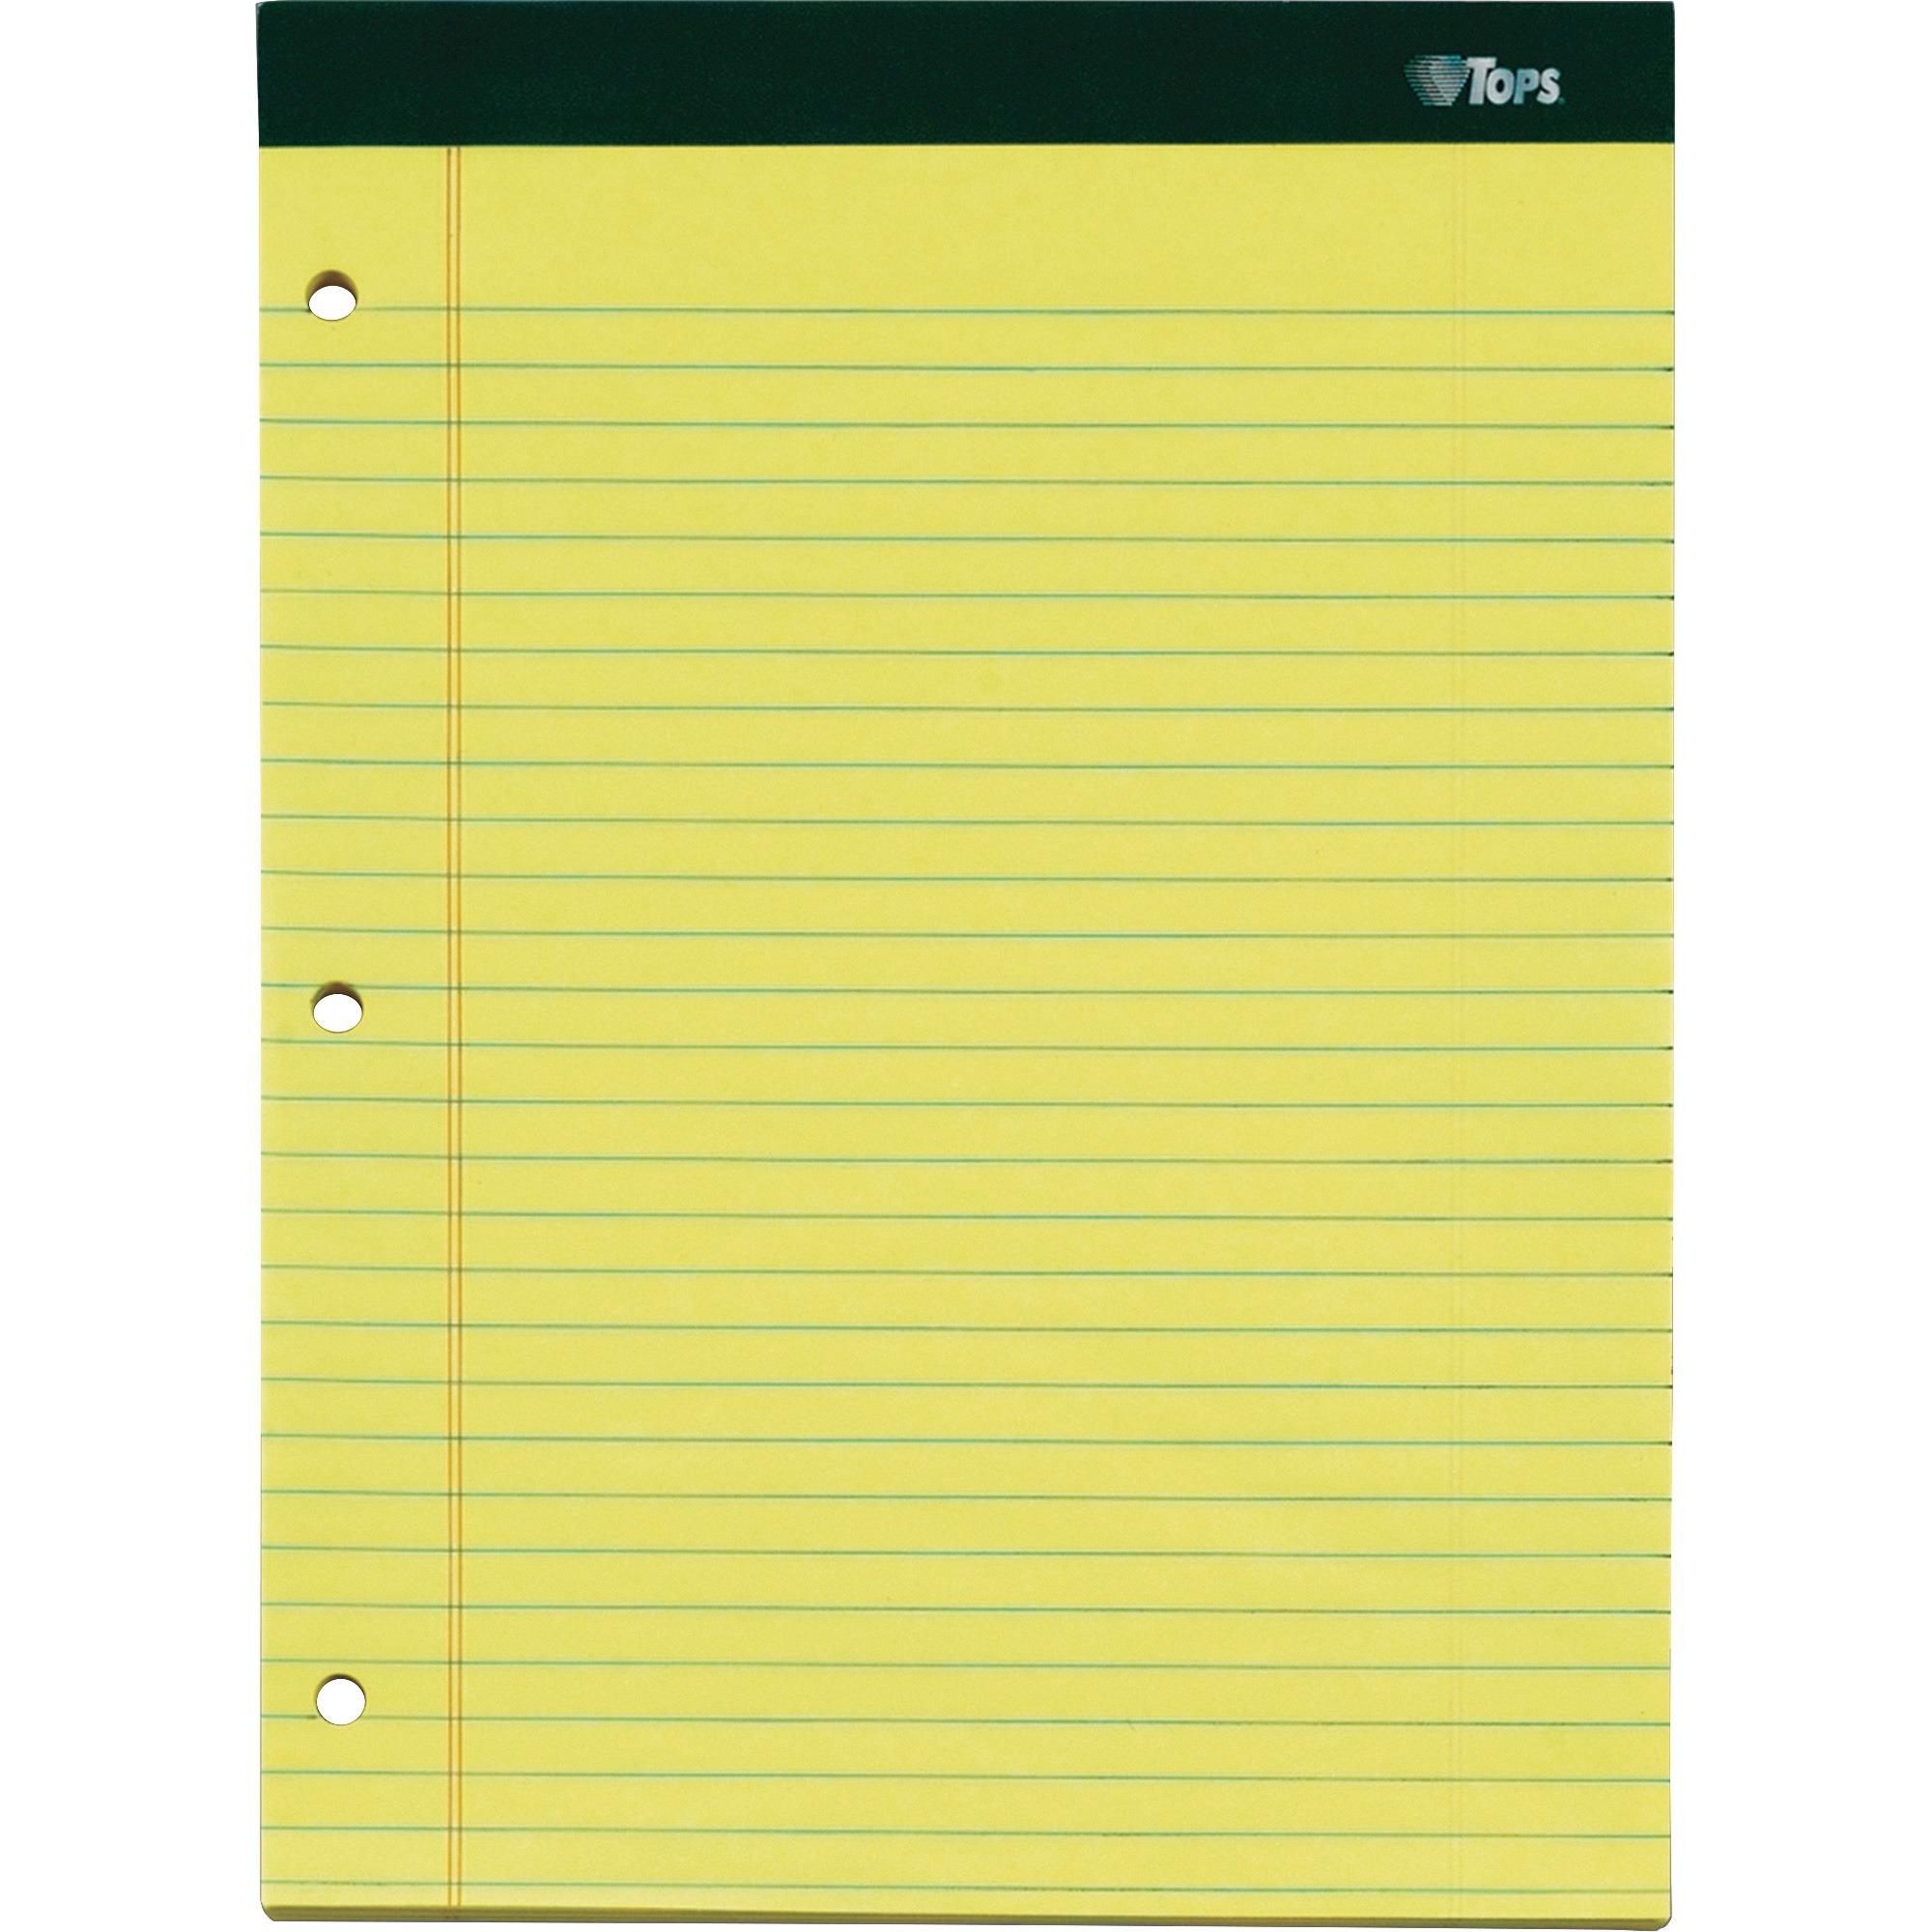 Customized writing paper pad